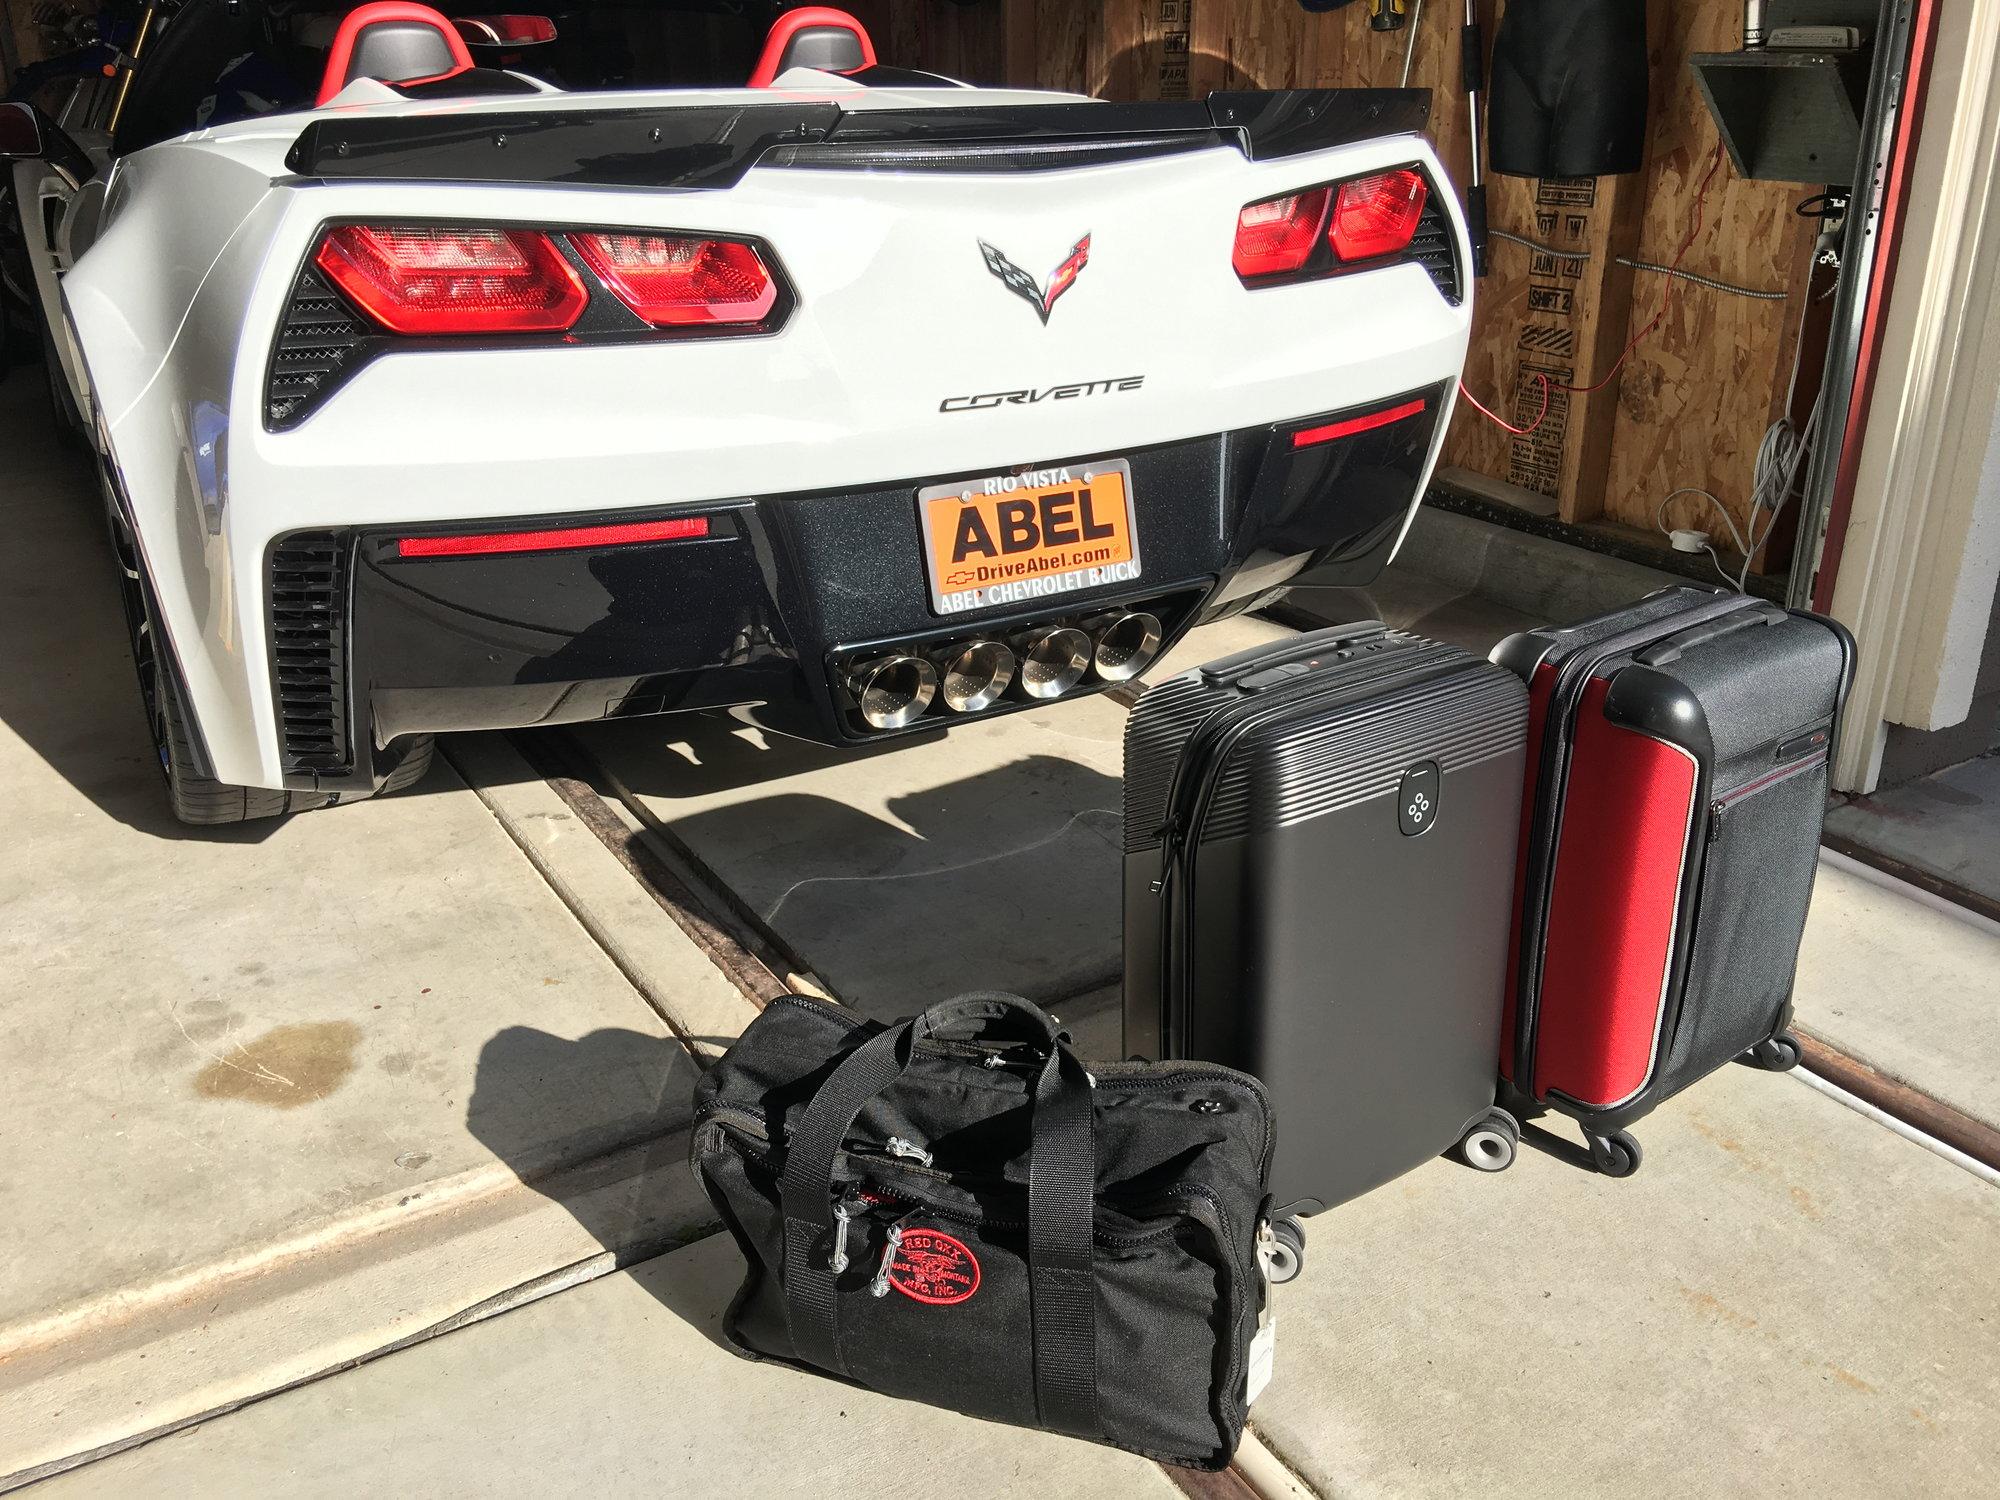 C7-How Much Luggage Space  - CorvetteForum - Chevrolet Corvette ... e83c0c46d6